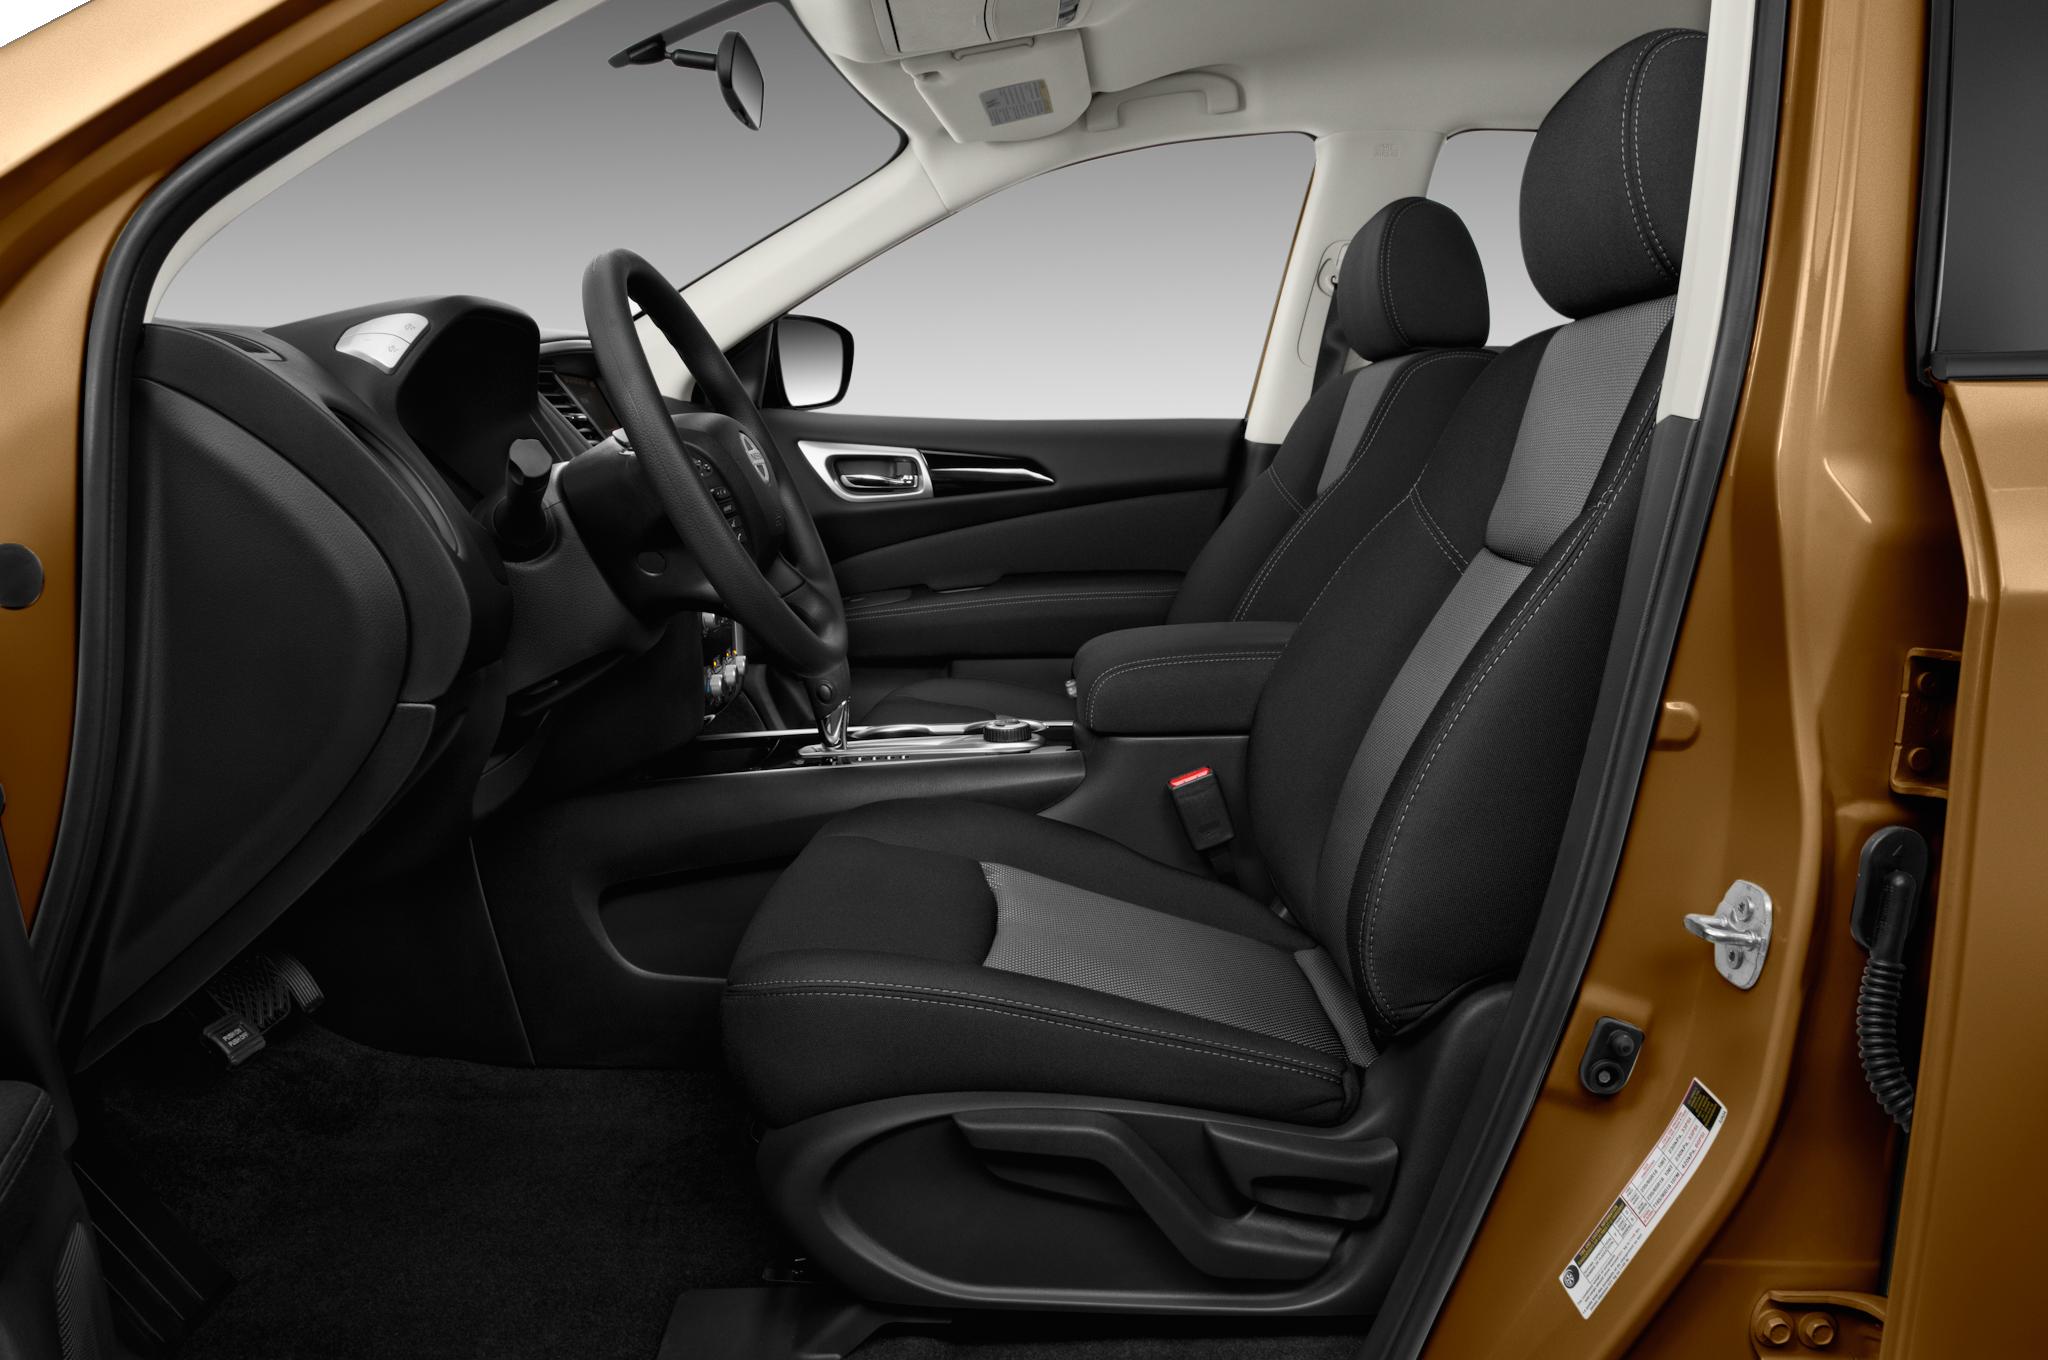 2018 nissan pathfinder 39 s rear door alert reminds you that you used the back seat automobile. Black Bedroom Furniture Sets. Home Design Ideas